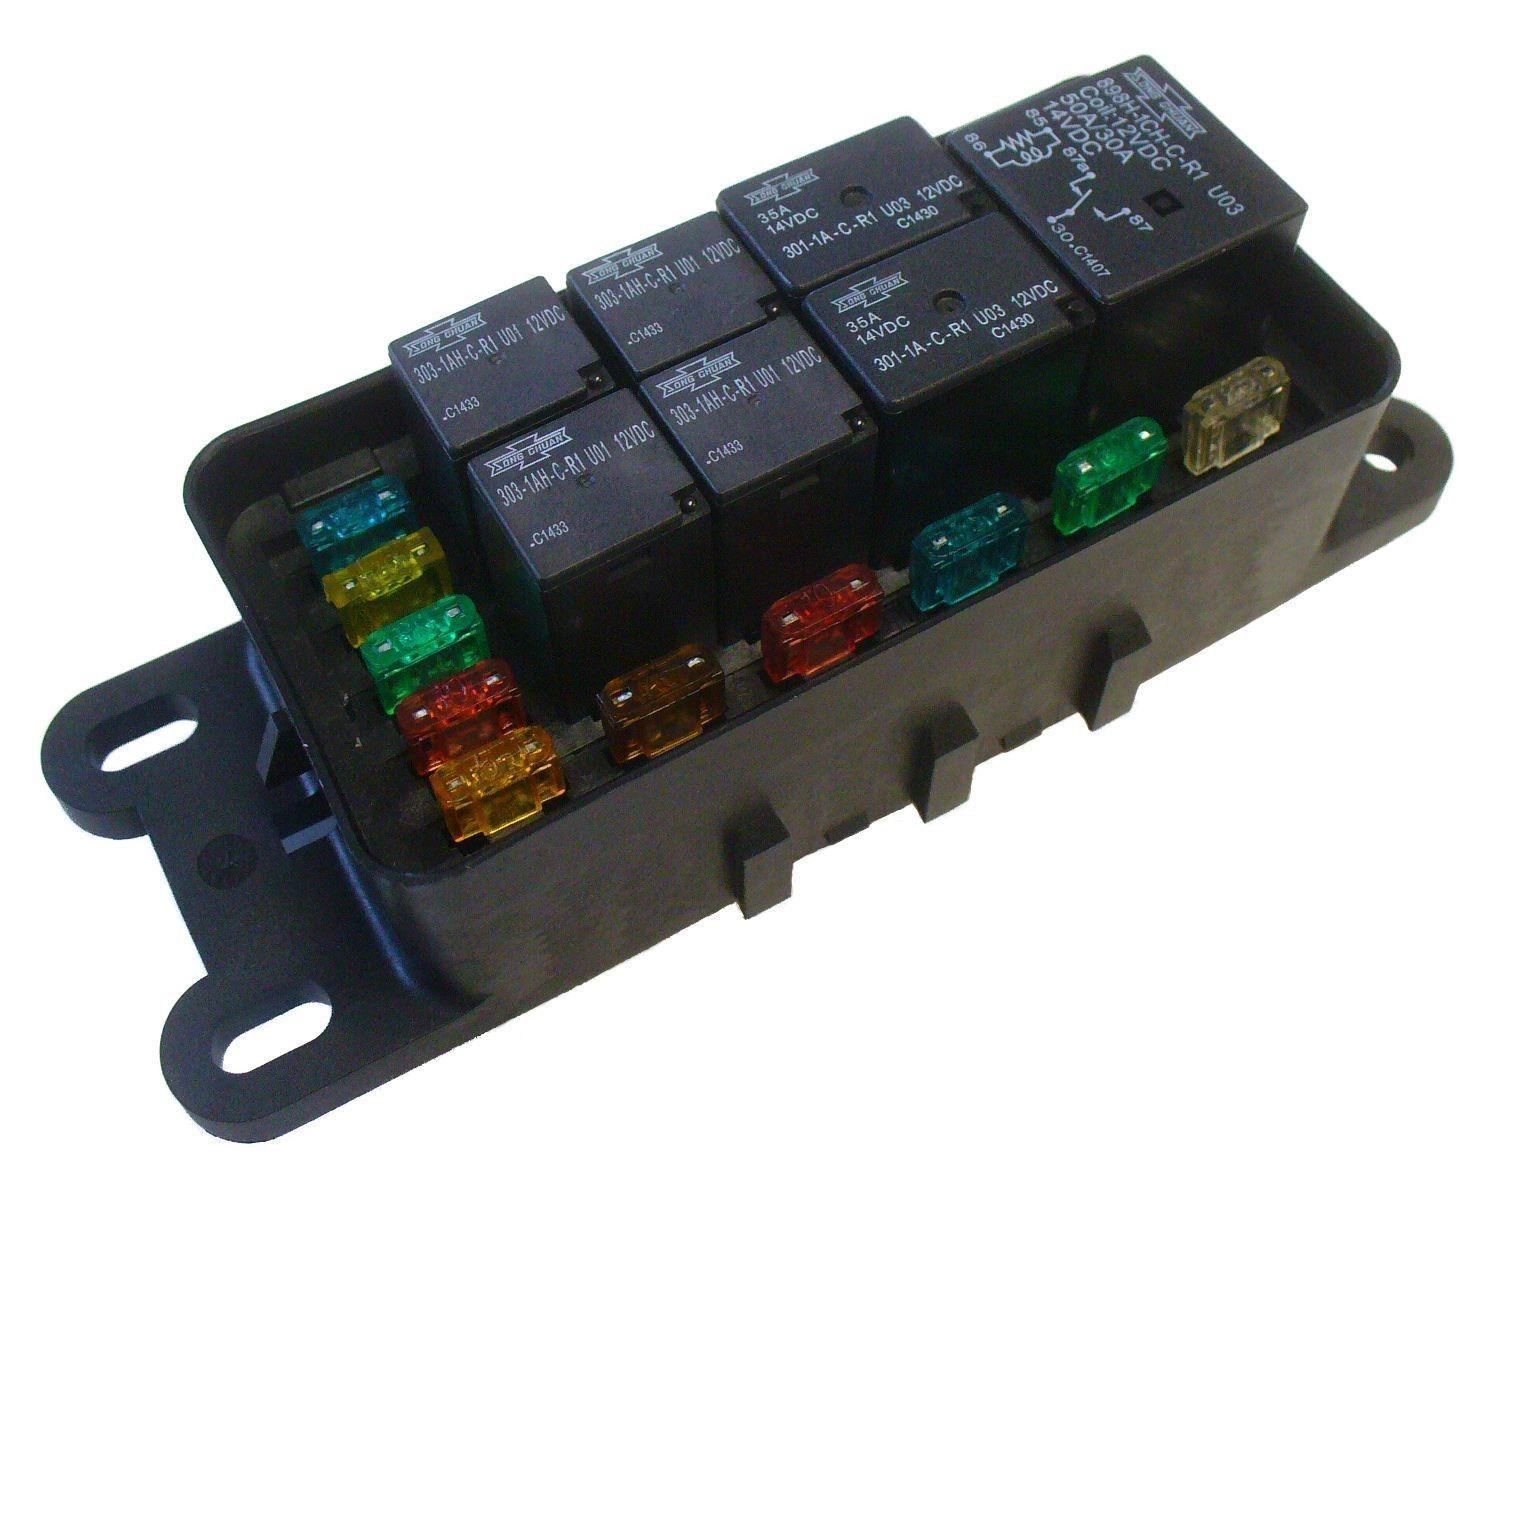 waterproof sealed fuse relay panel block atv utv car truck 12v off road tractor ebay [ 1536 x 1536 Pixel ]